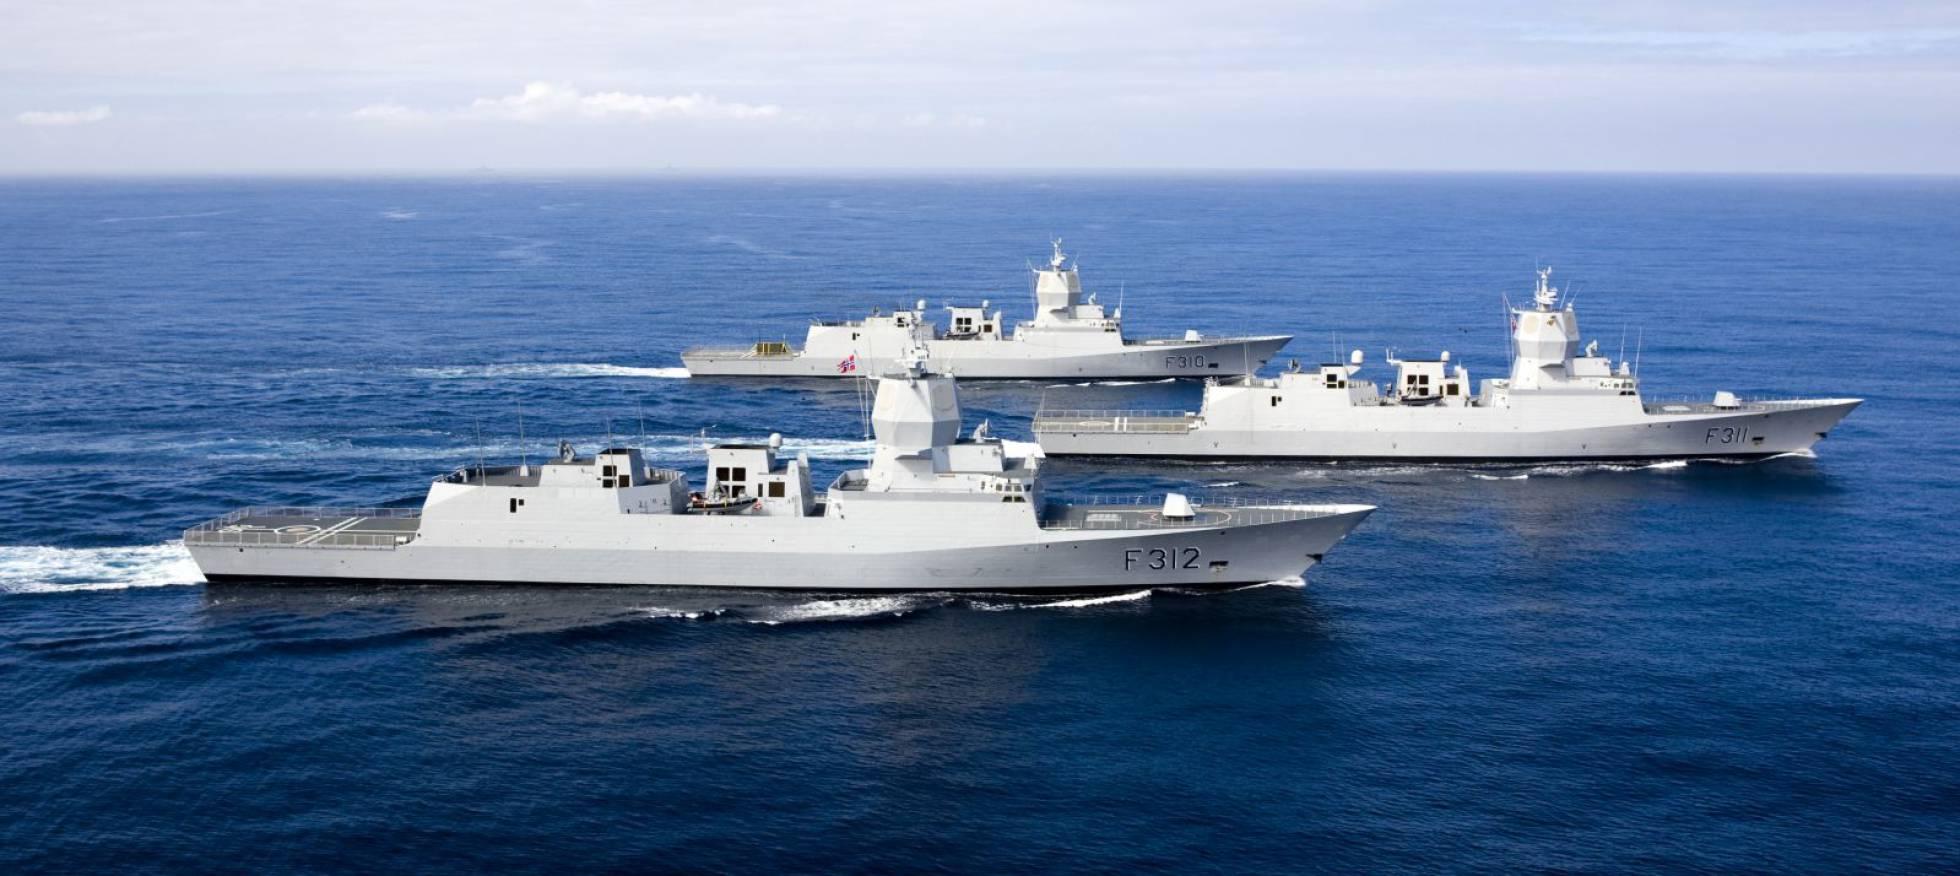 Испания потратит 7,3 млрд евро на технику для Вооруженных сил